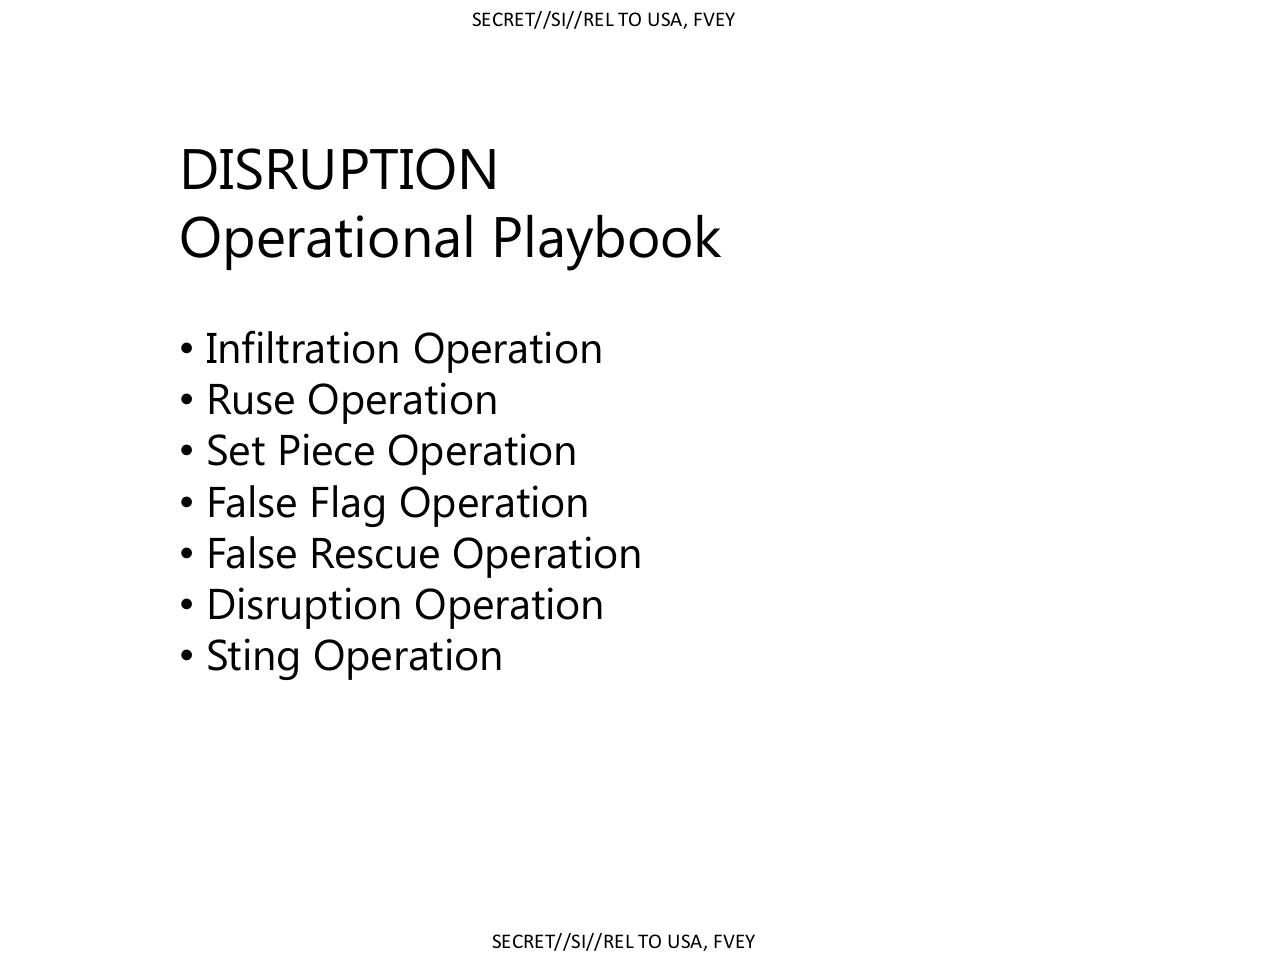 deception_p47.jpg